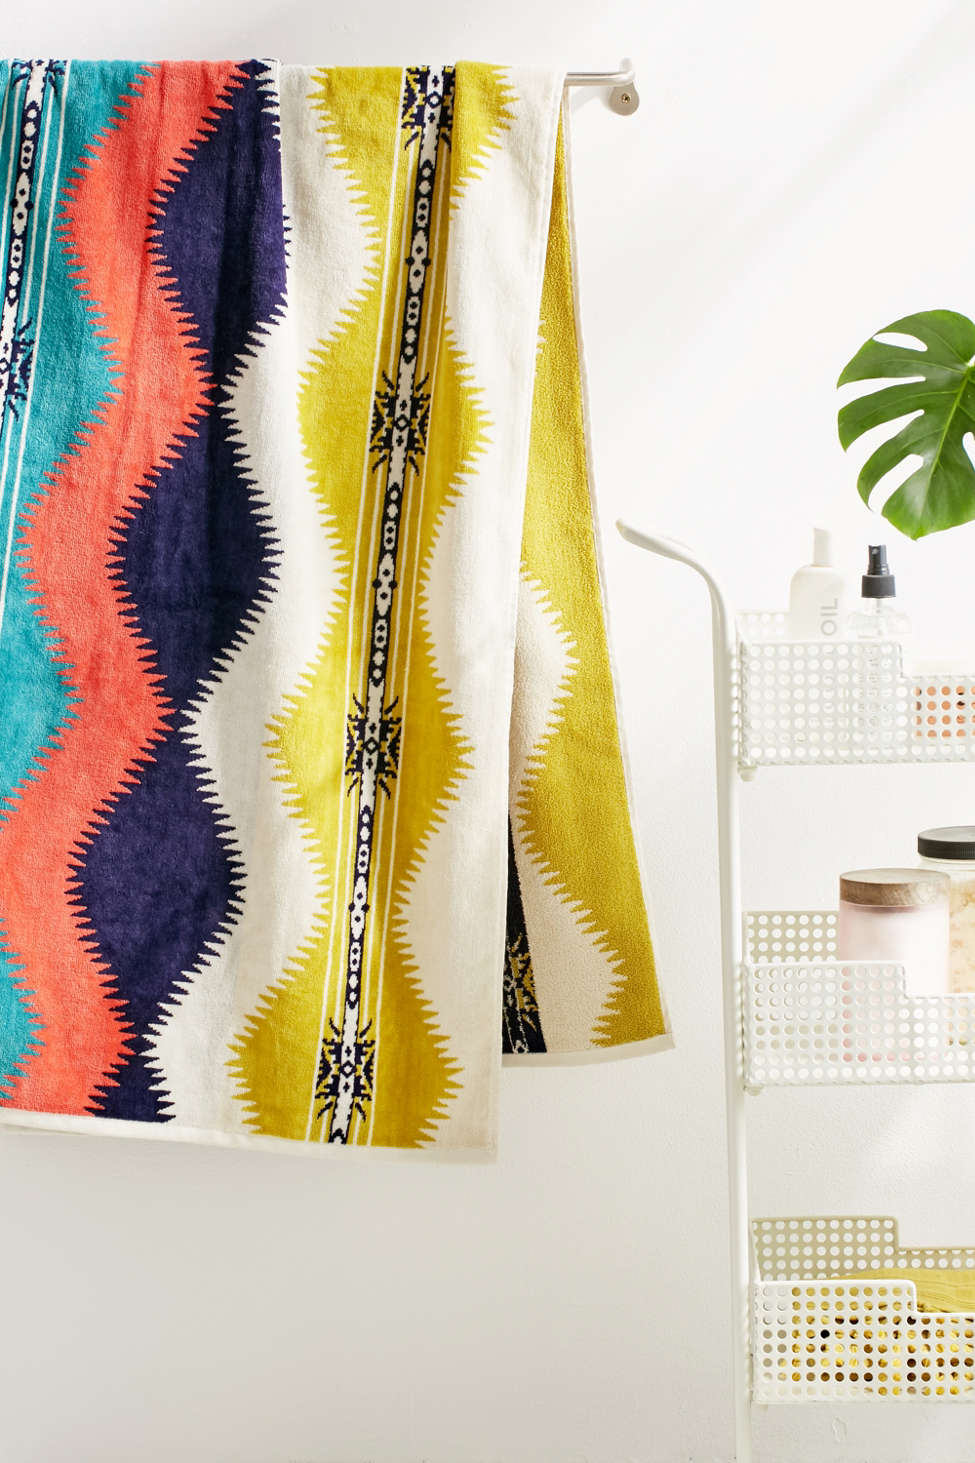 Slide View: 1: Pendleton Saguaro Oversized Towel